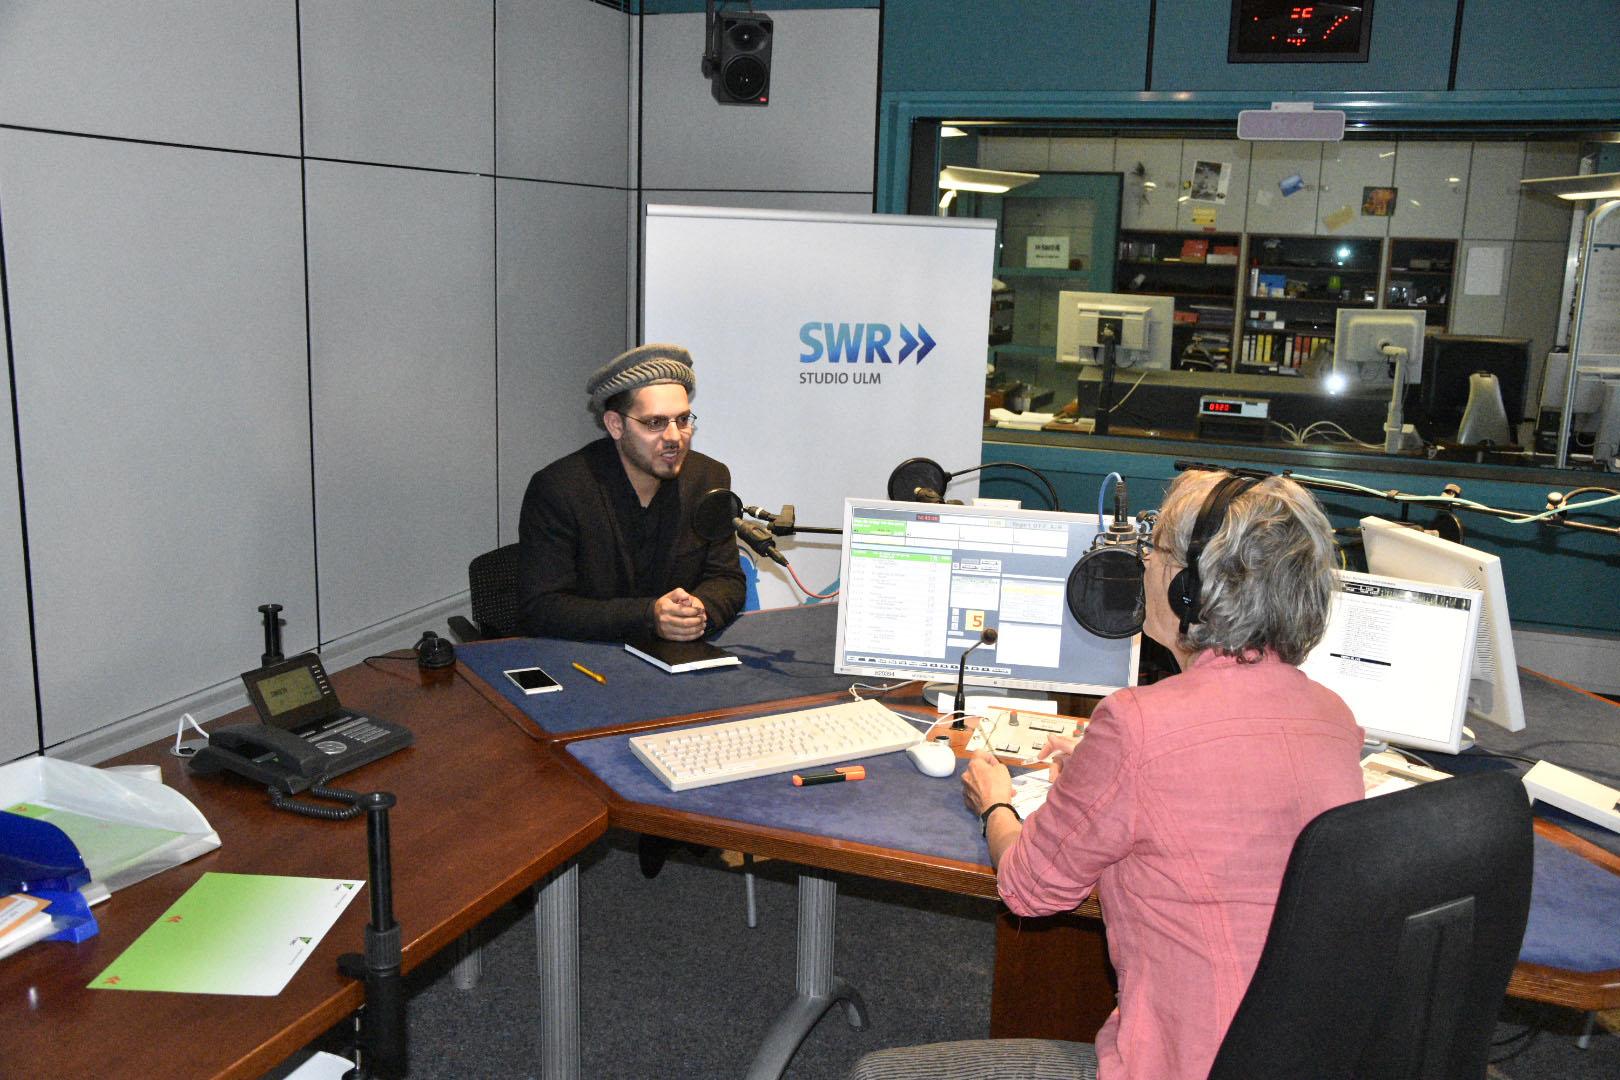 Swr Interview